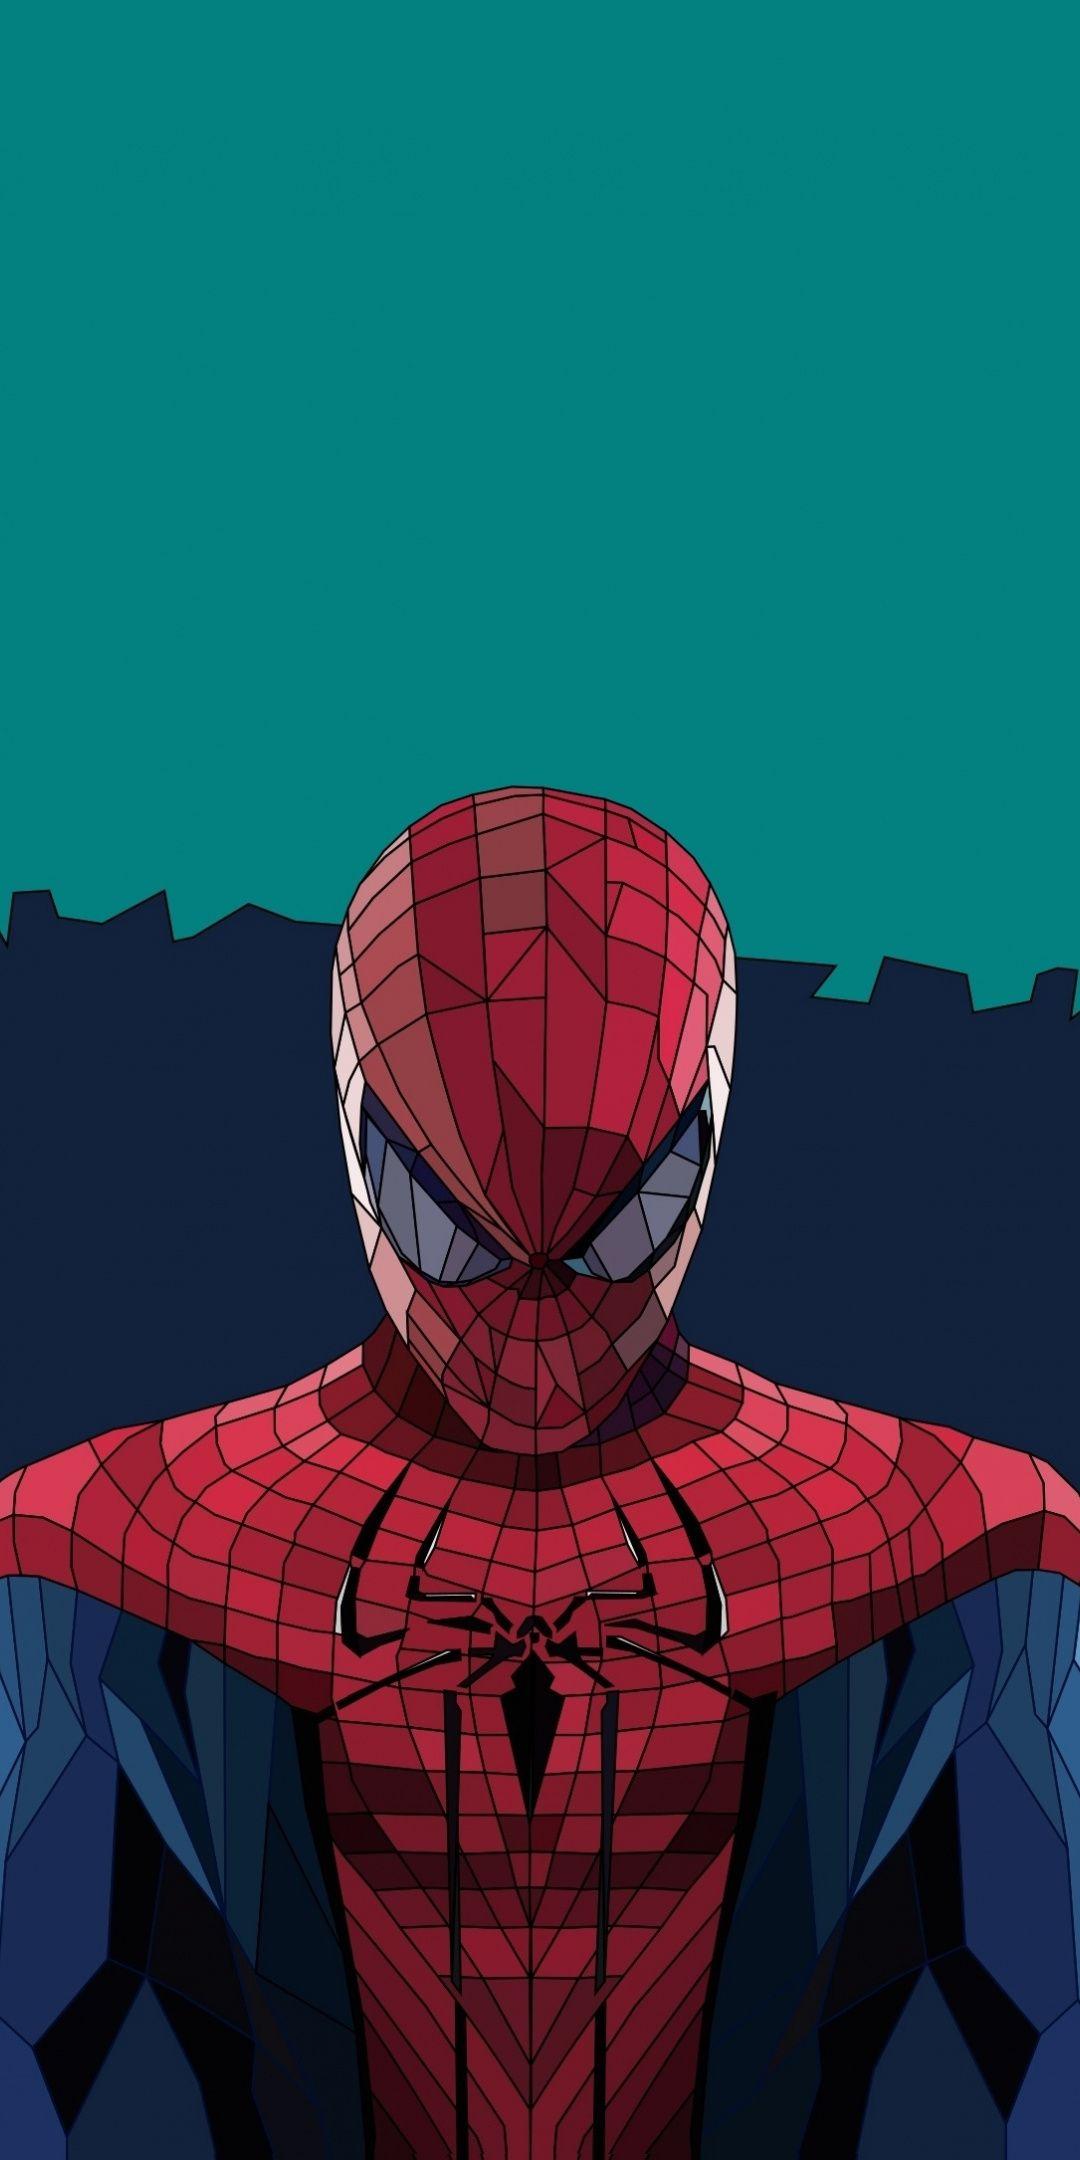 Spider Man Low Poly Art 1080x2160 Wallpaper Superhero Wallpaper Marvel Wallpaper Marvel Artwork